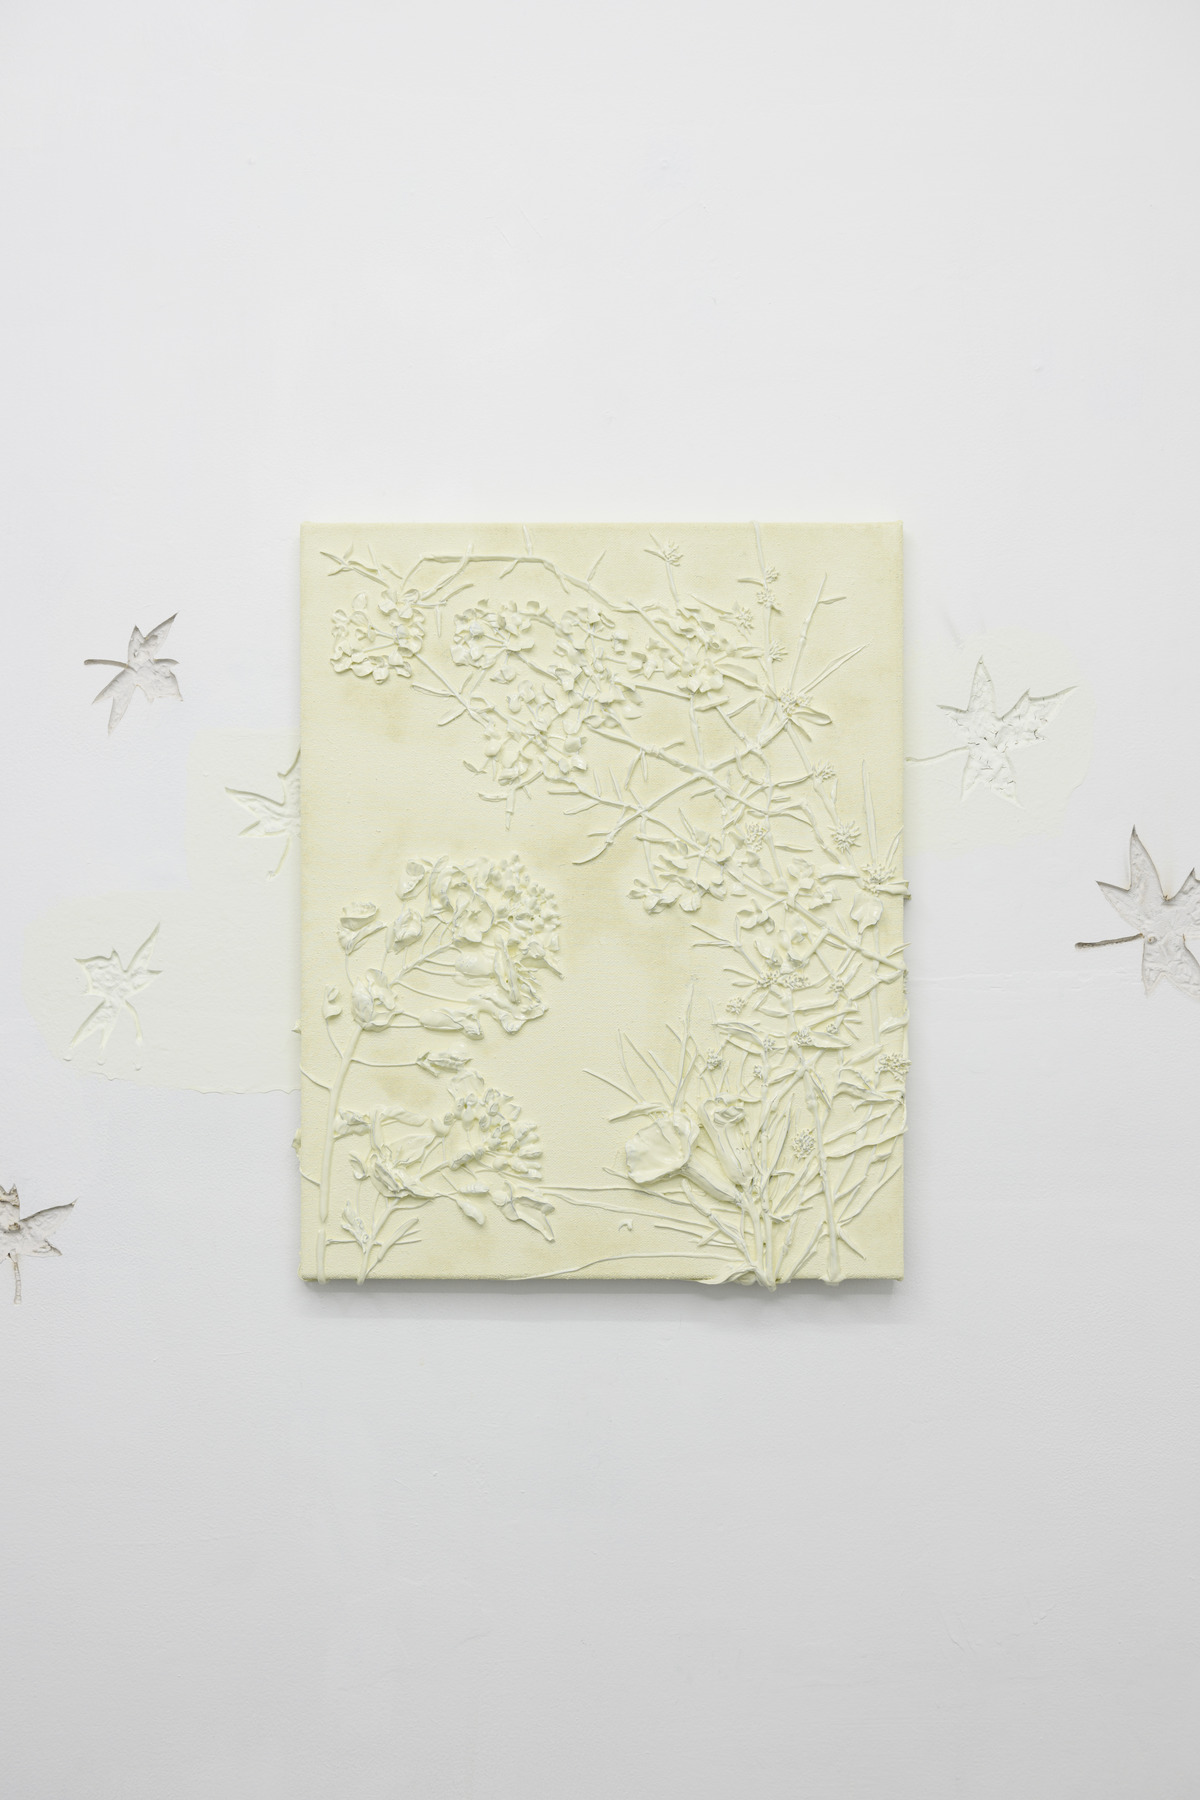 Michael Assiff-Ozone Flowers 13